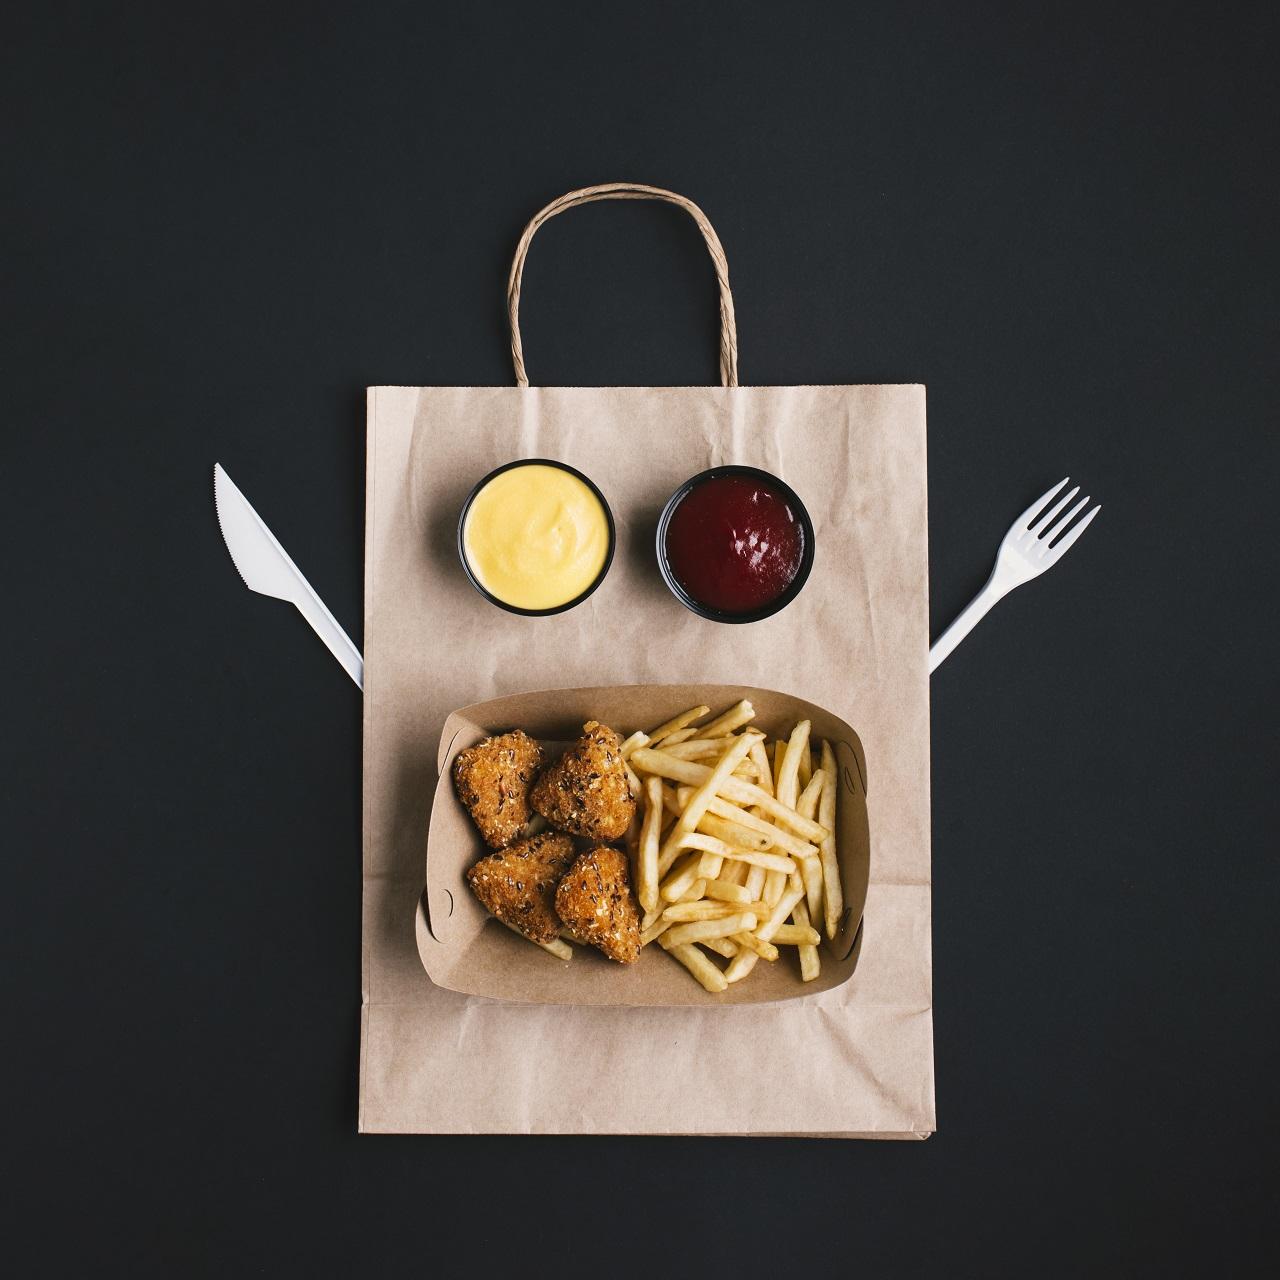 Restaurante entregam comida